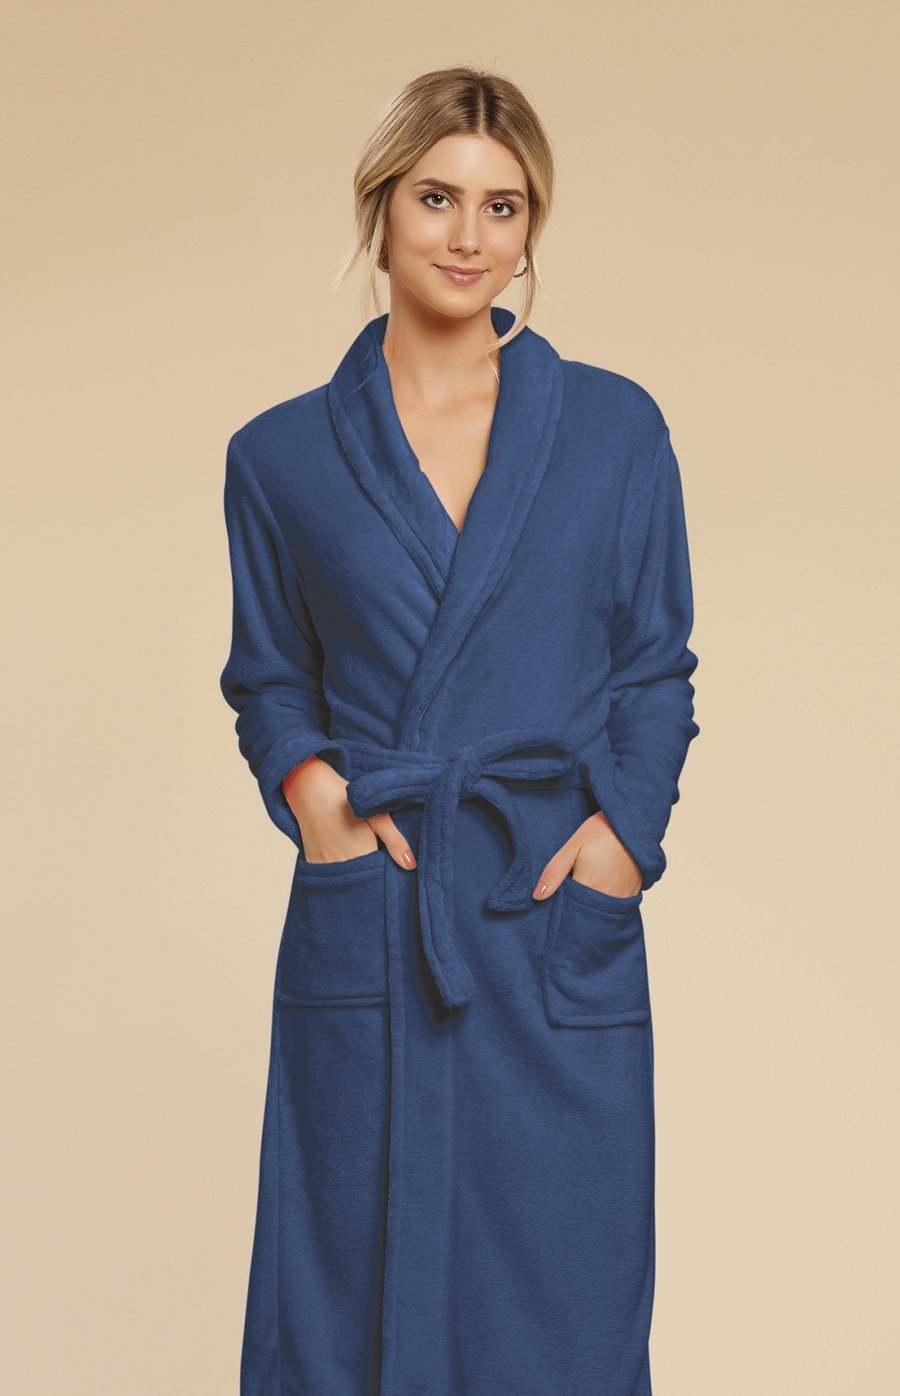 d9c4c6129 Robe Soft Inverno 2019 CLOUD CLUB